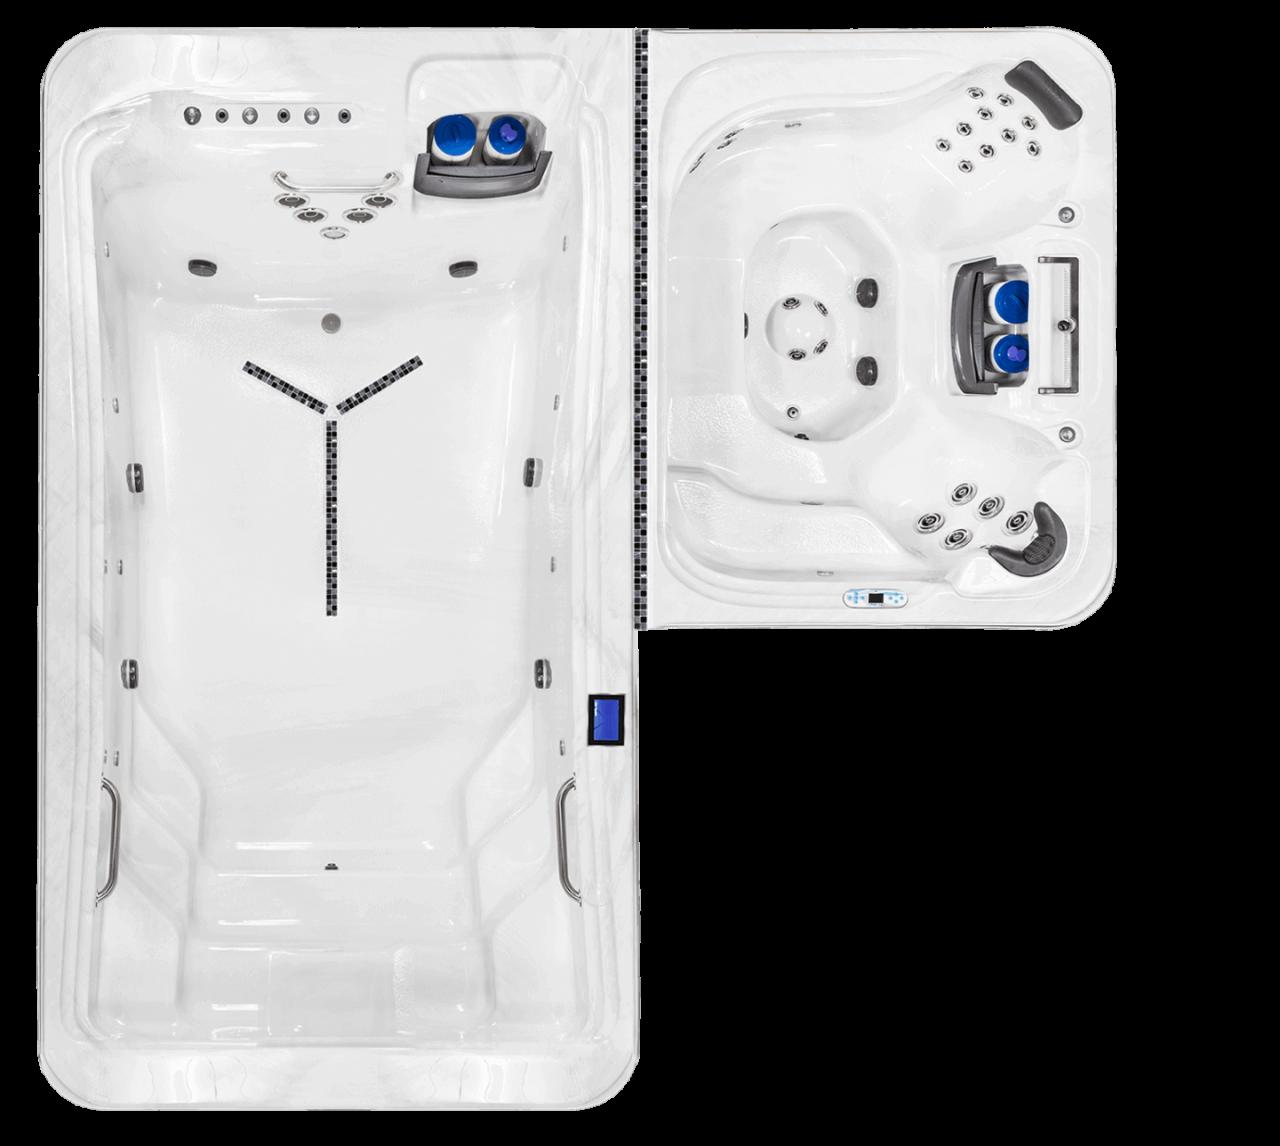 Dual SwimSpa DTL-6